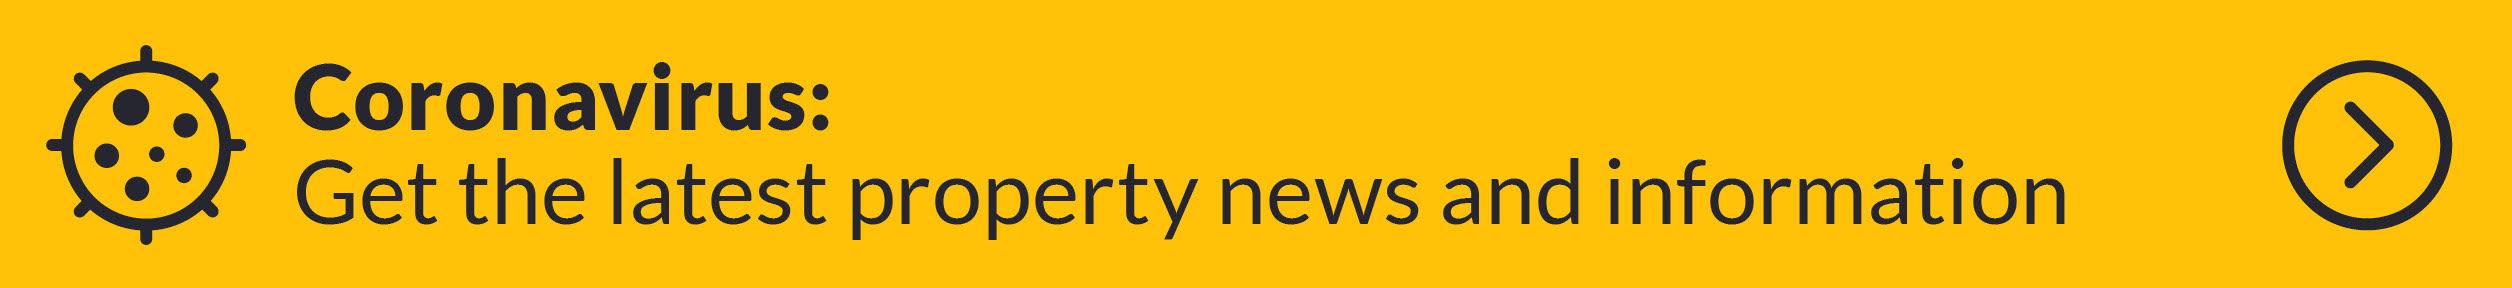 Coronavirus: Get the latest property news and information